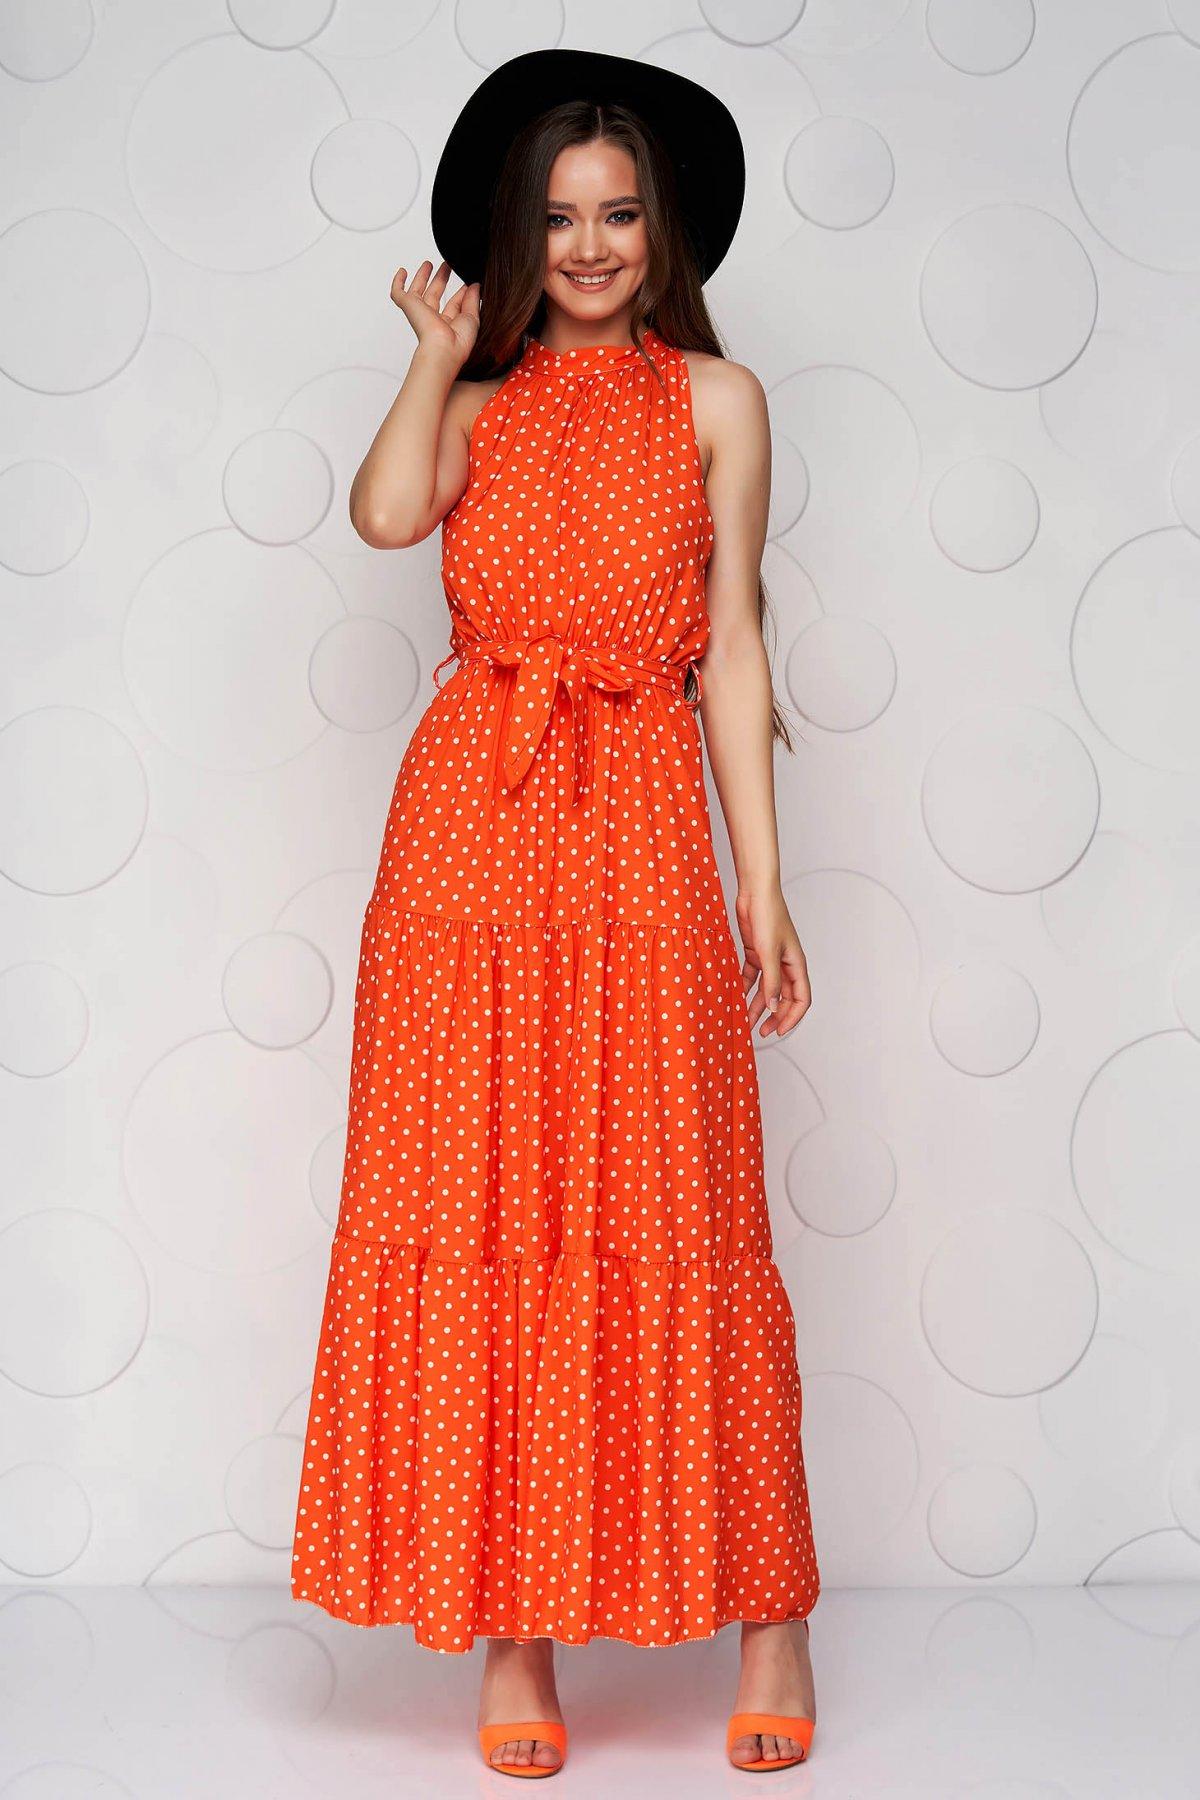 Rochie SunShine portocalie din material vaporos in clos cu buline si guler tip halter - medelin.ro